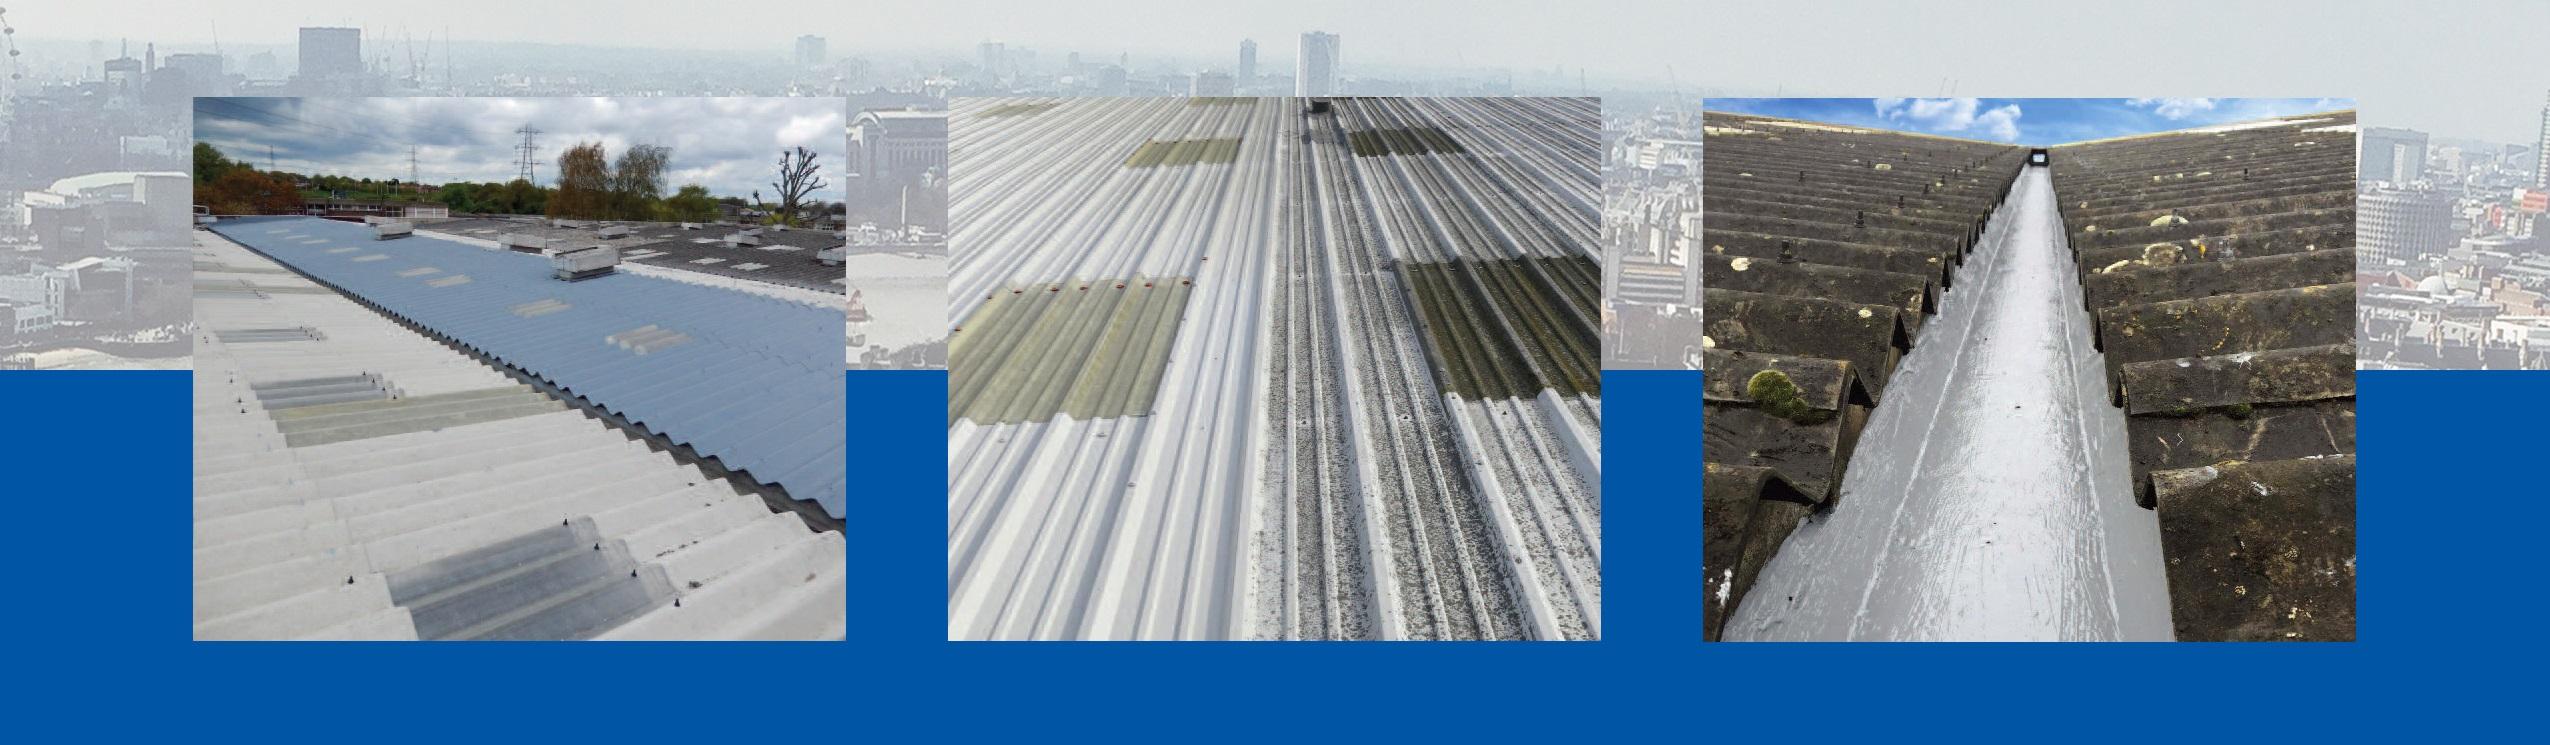 Liquasil Roof Examples